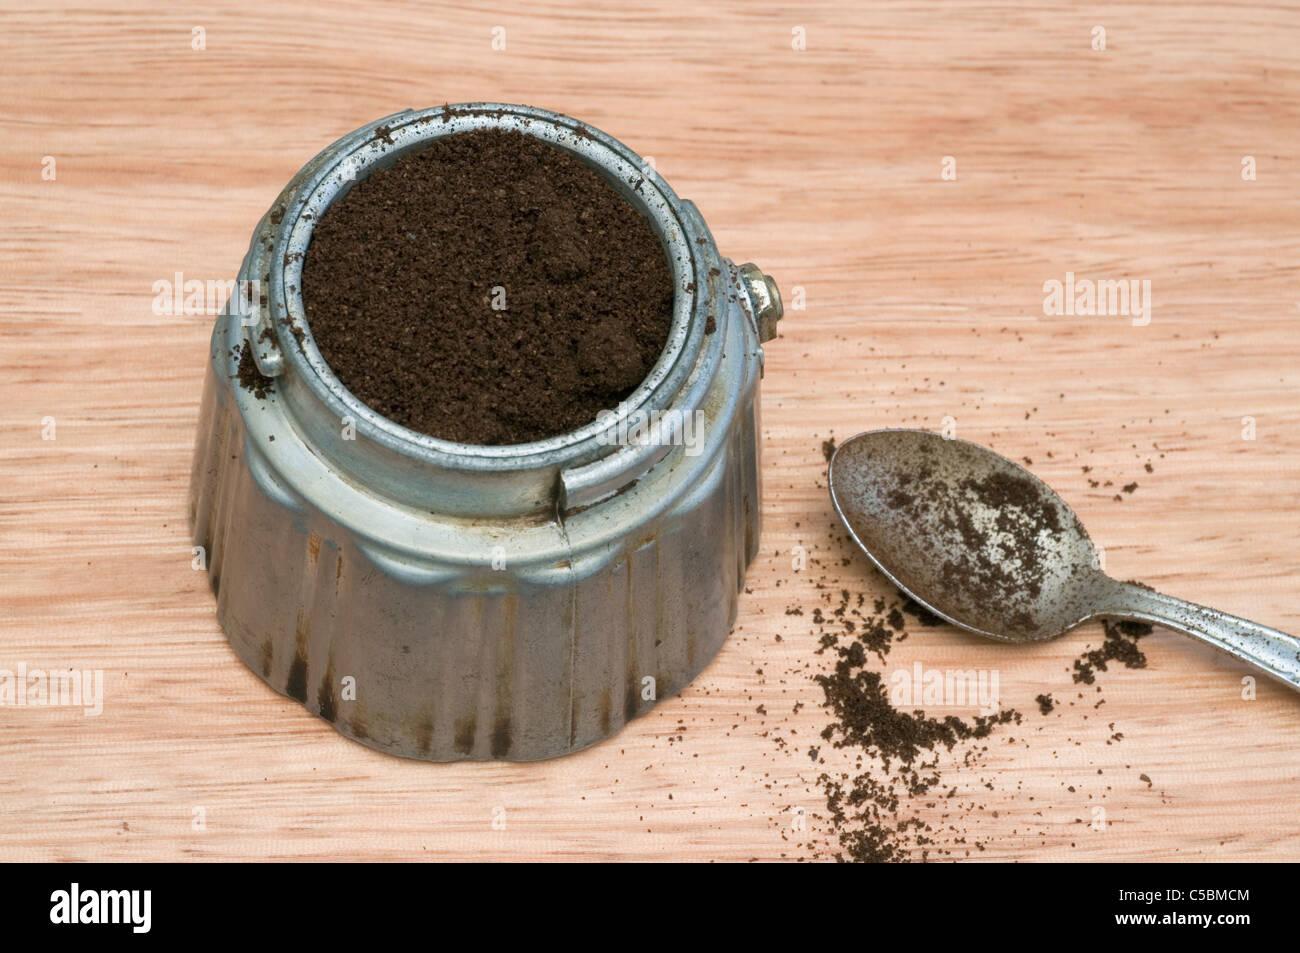 opened coffee moka pot and spoon - Stock Image